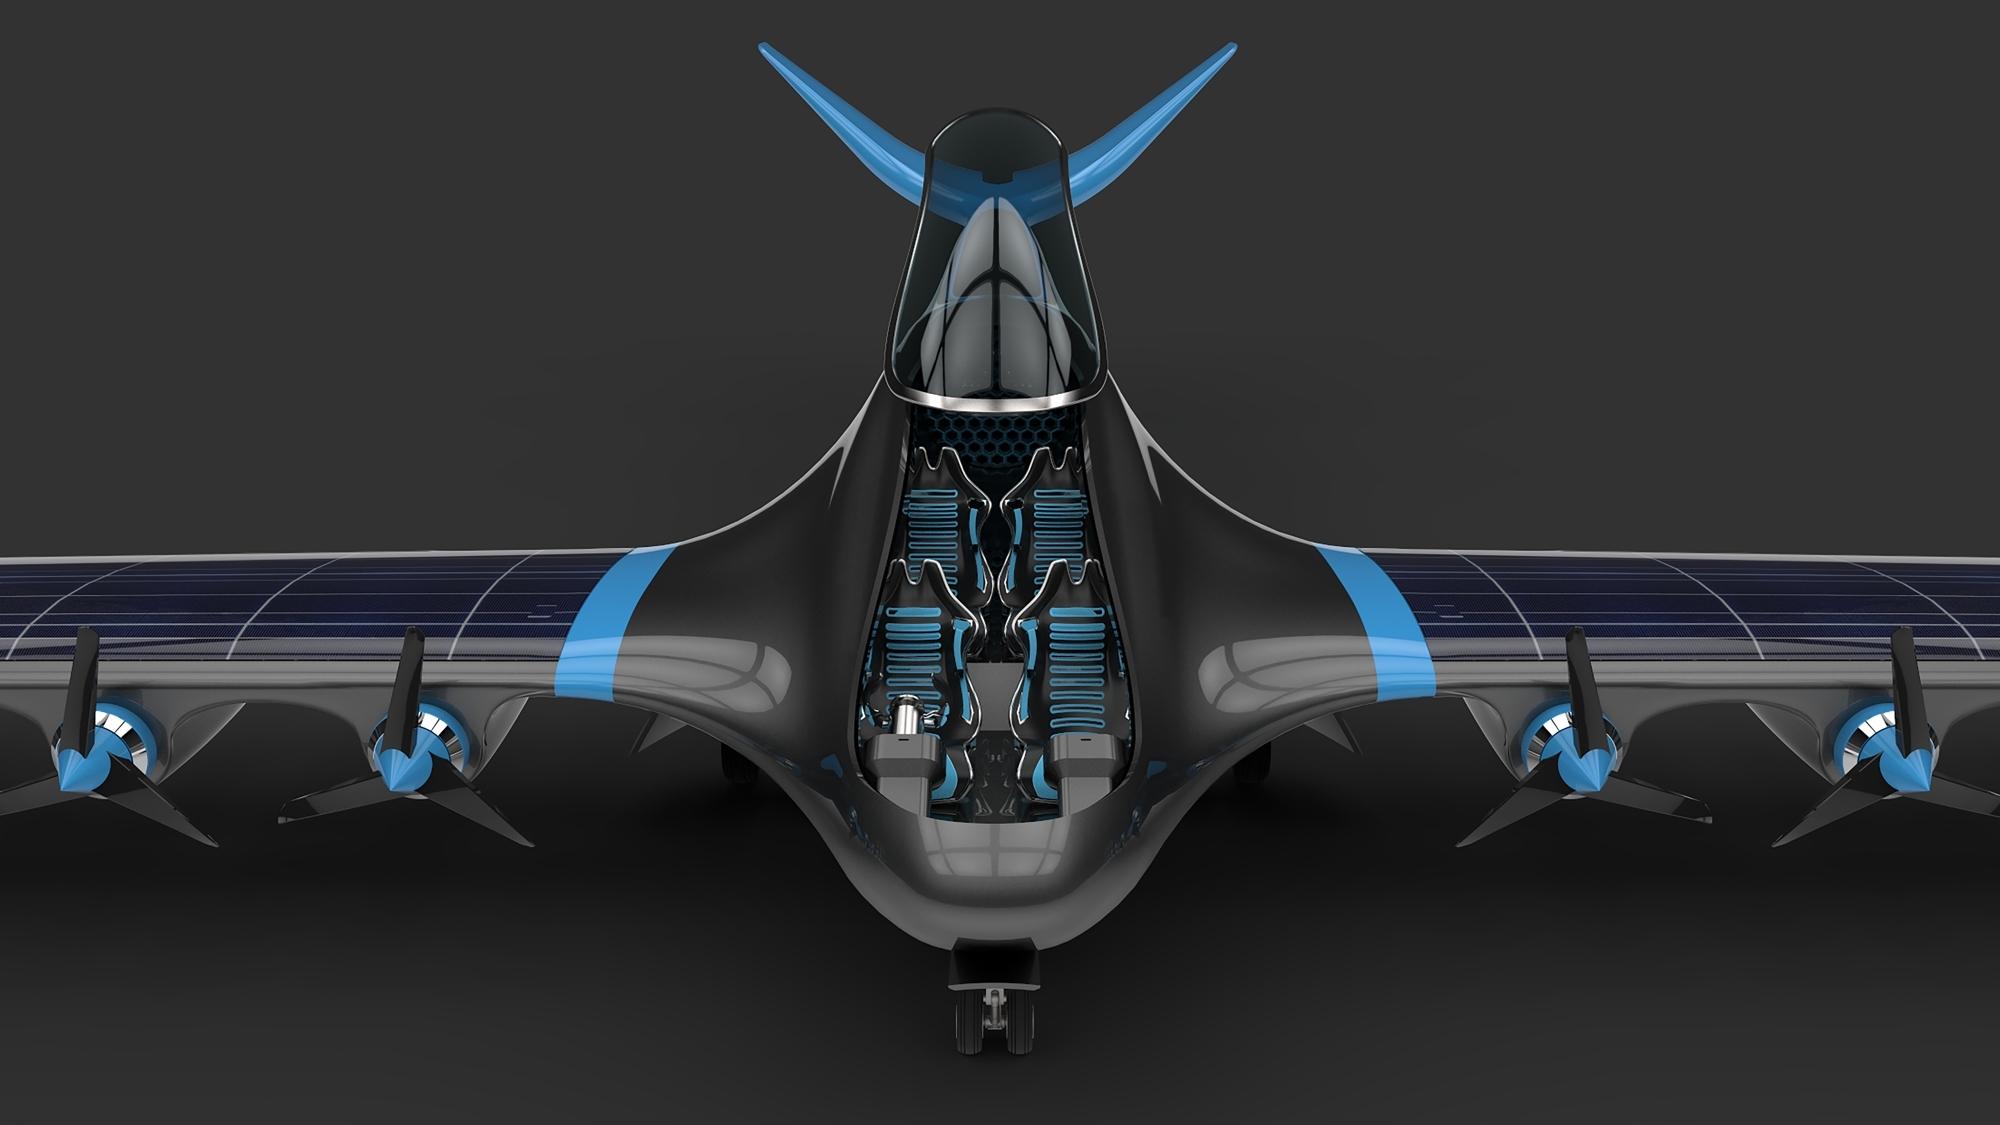 Element One avion hydrogène 1